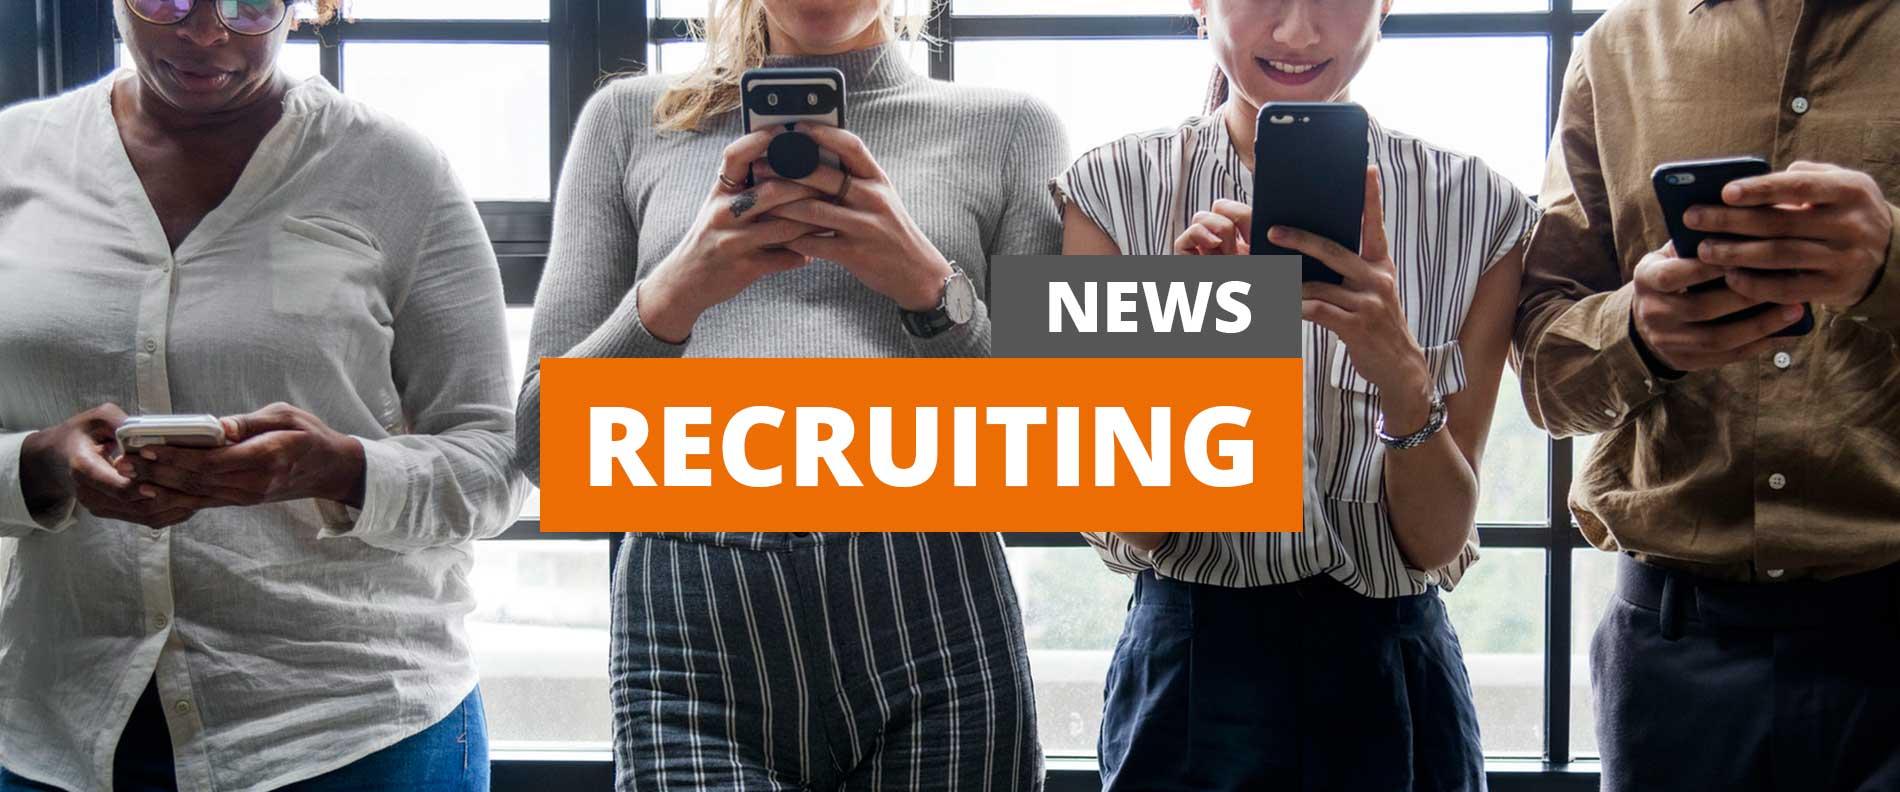 recruiting-news_2019-02-04